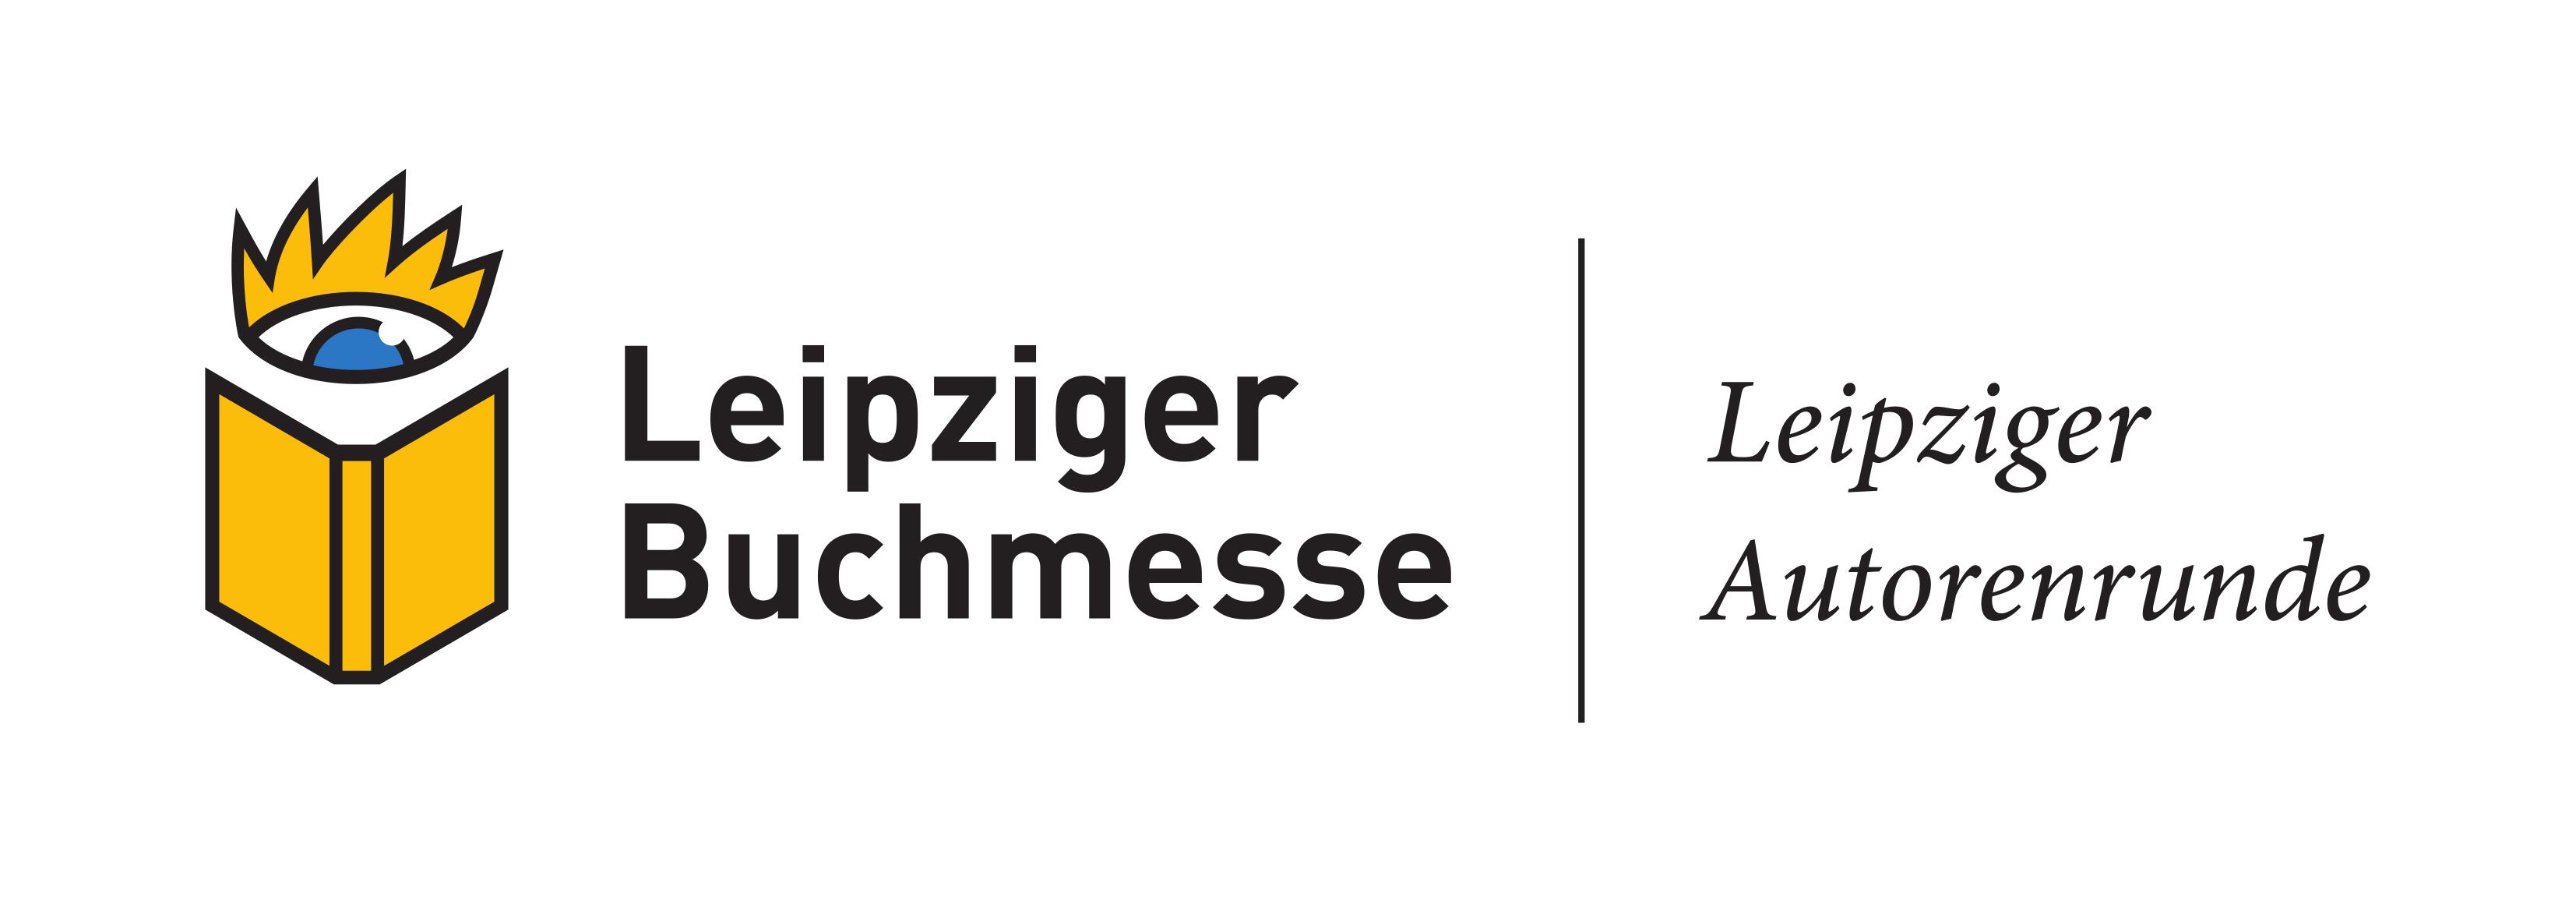 Leipziger Autorenrunde 2021 Digital